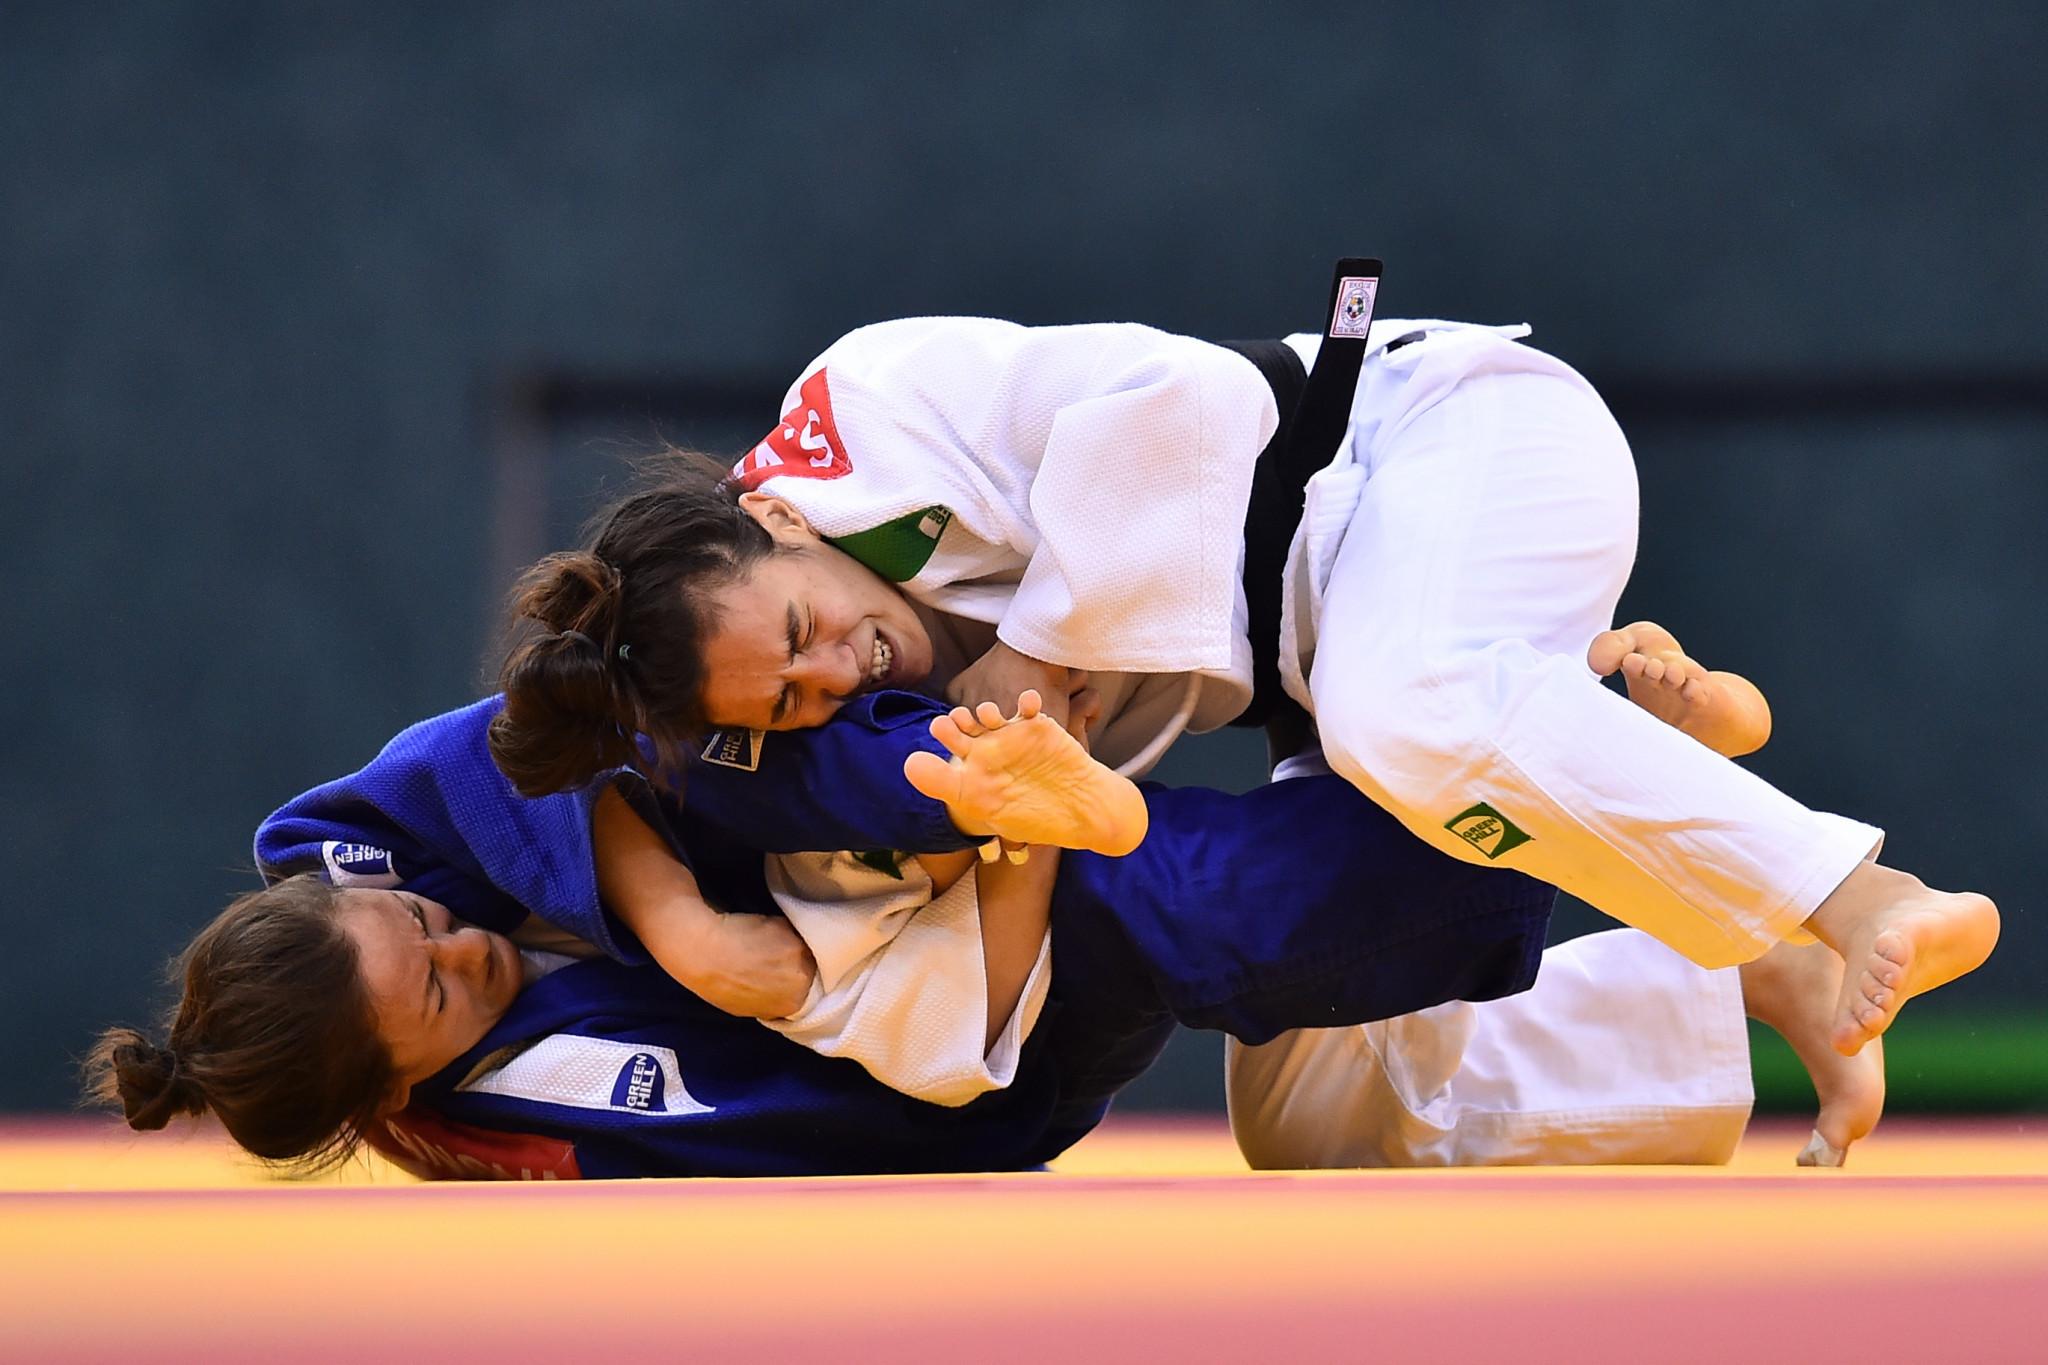 Azerbaijan collect three golds on opening day of IBSA Judo Grand Prix in Baku